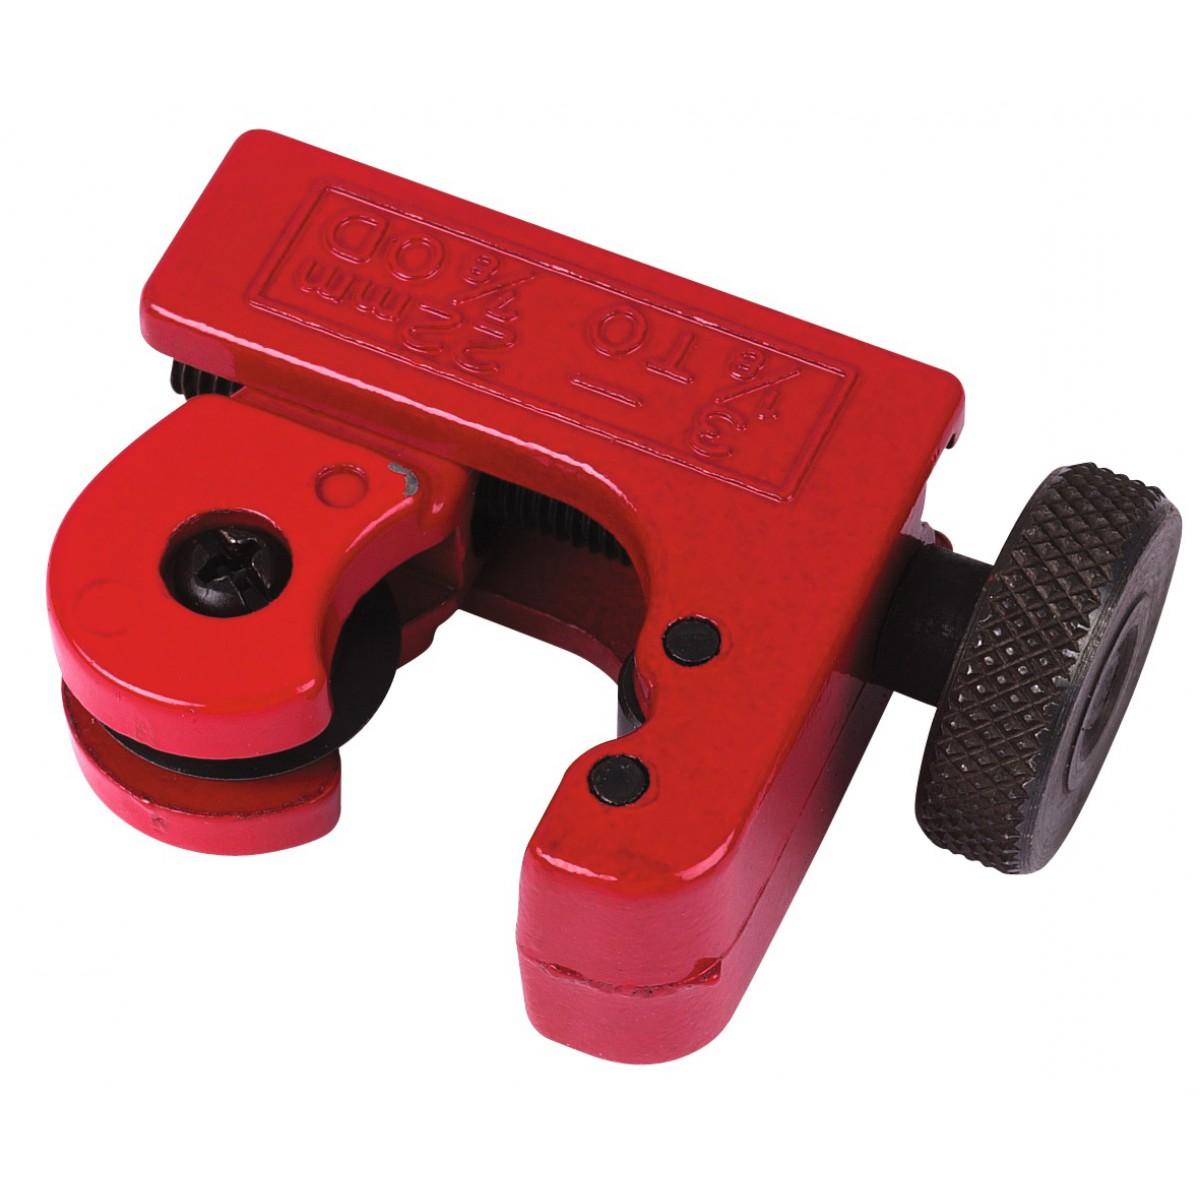 Mini coupe-tube Prci - Diamètre de coupe 3 à 22 mm